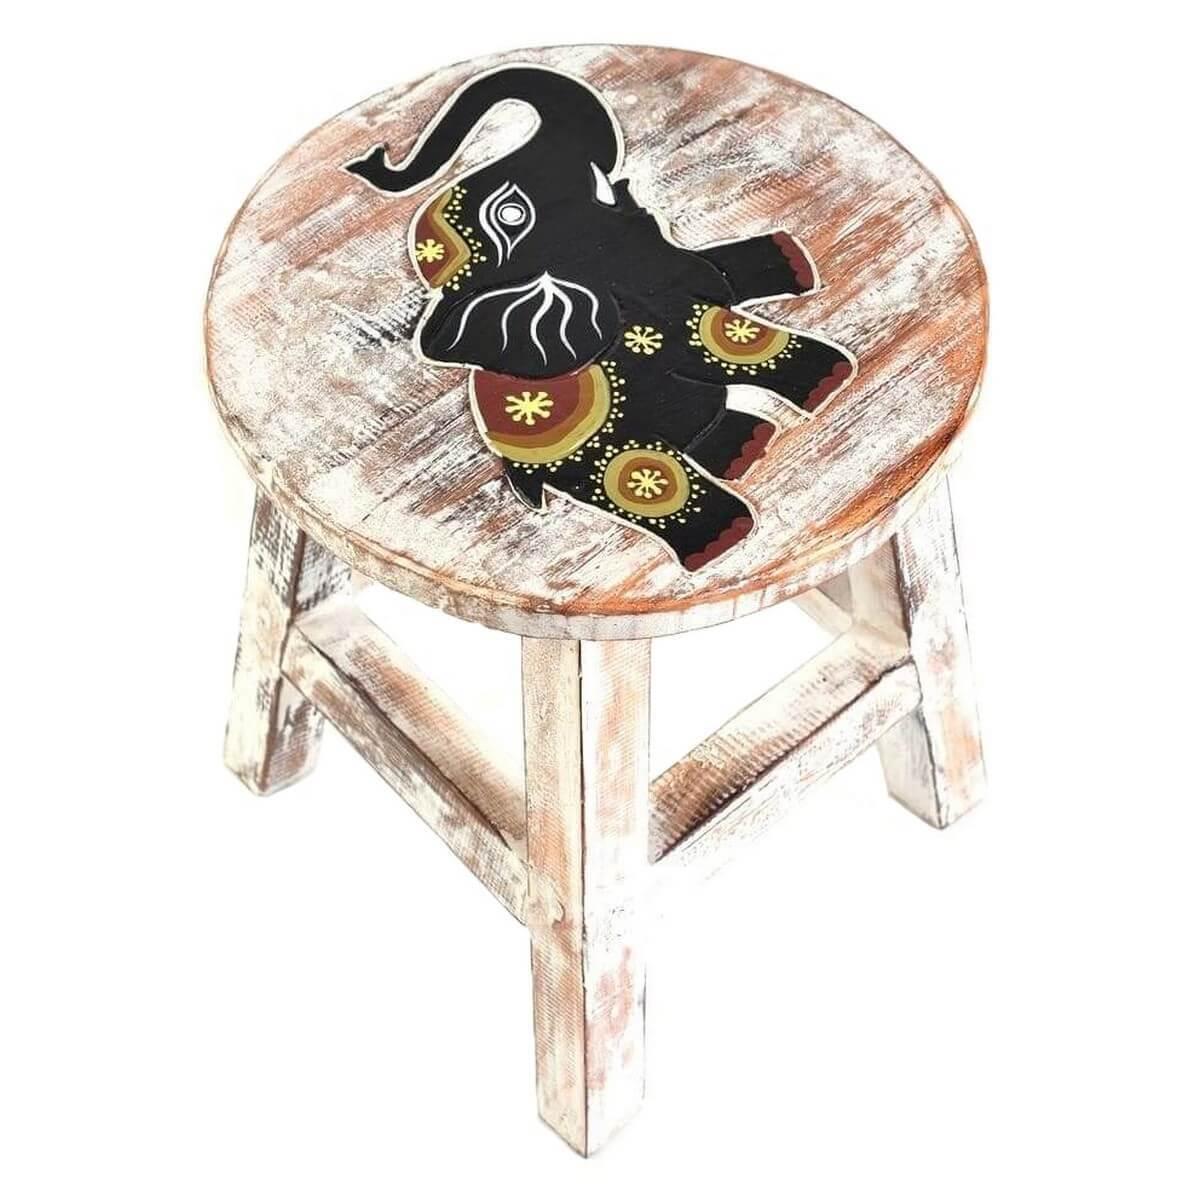 holzhocker kinderhocker hocker sitzhocker fu bank holz. Black Bedroom Furniture Sets. Home Design Ideas